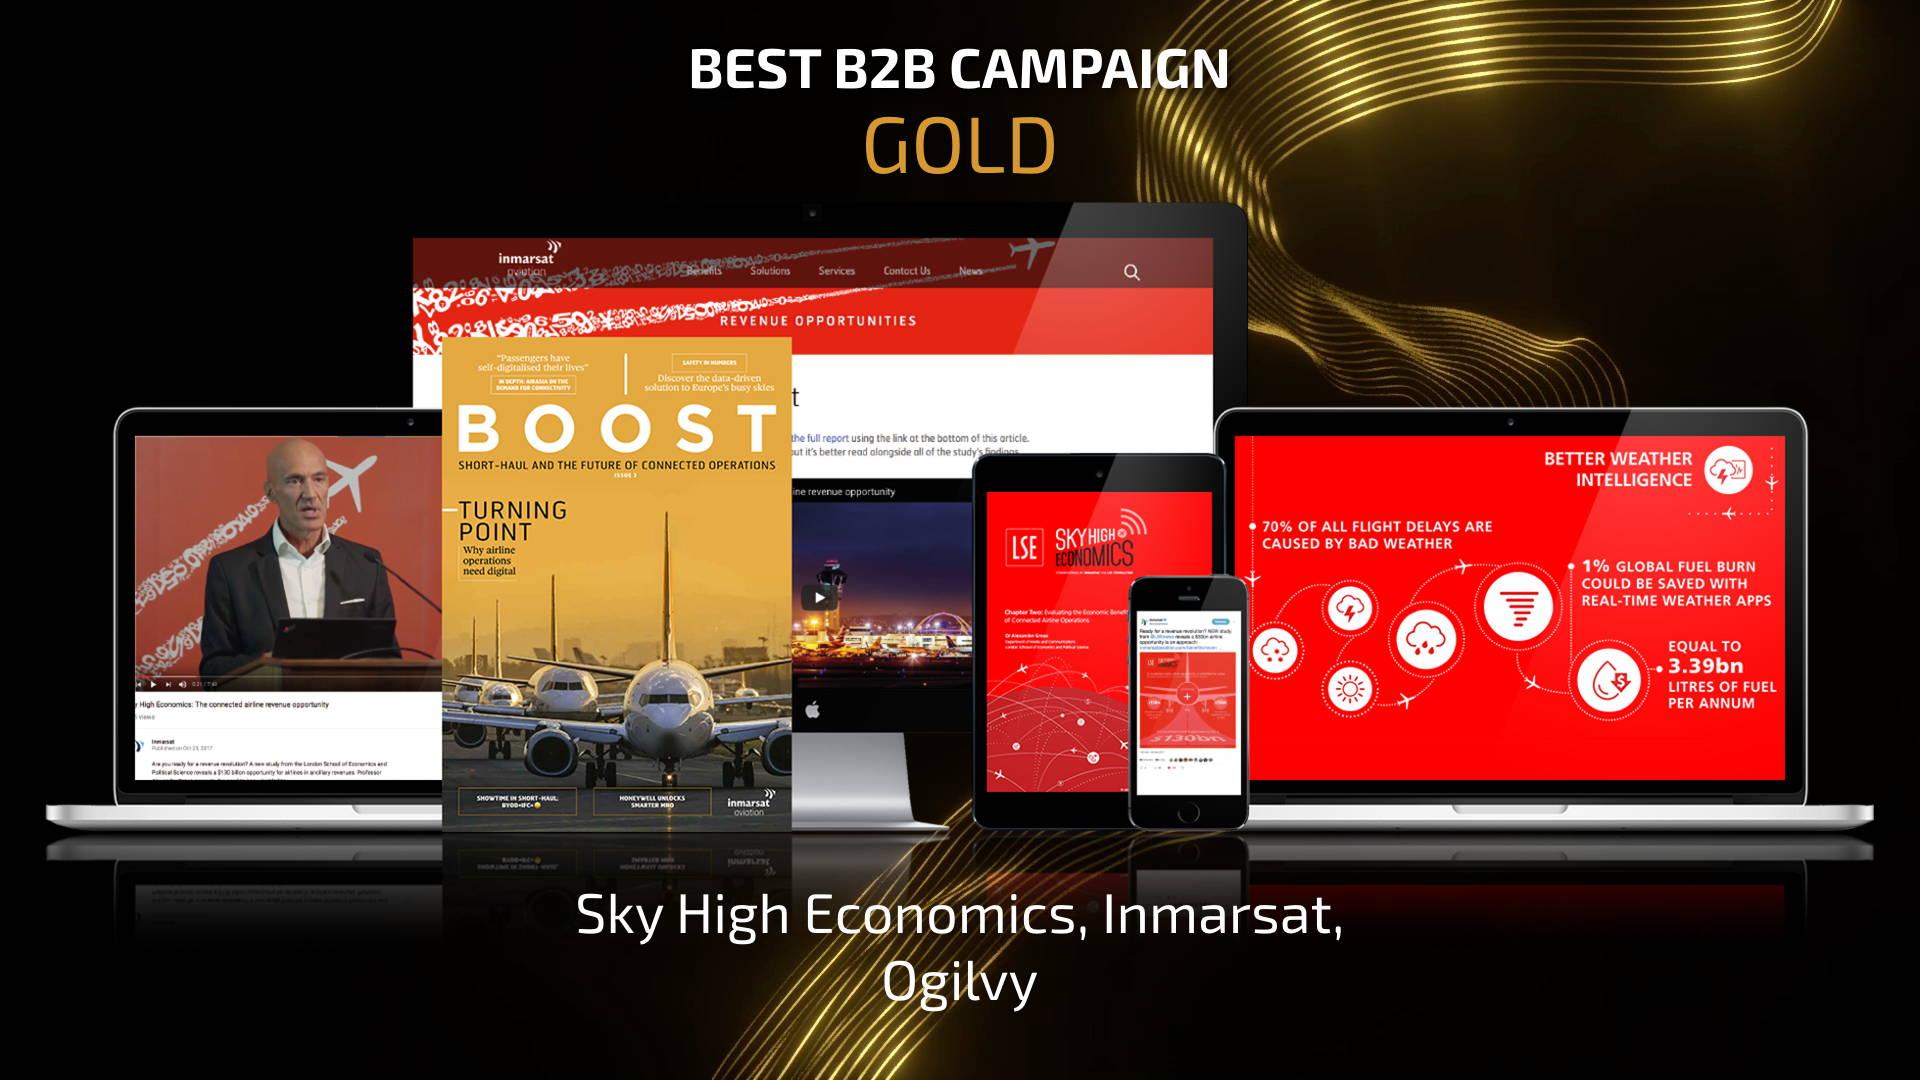 Best B2B - Gold